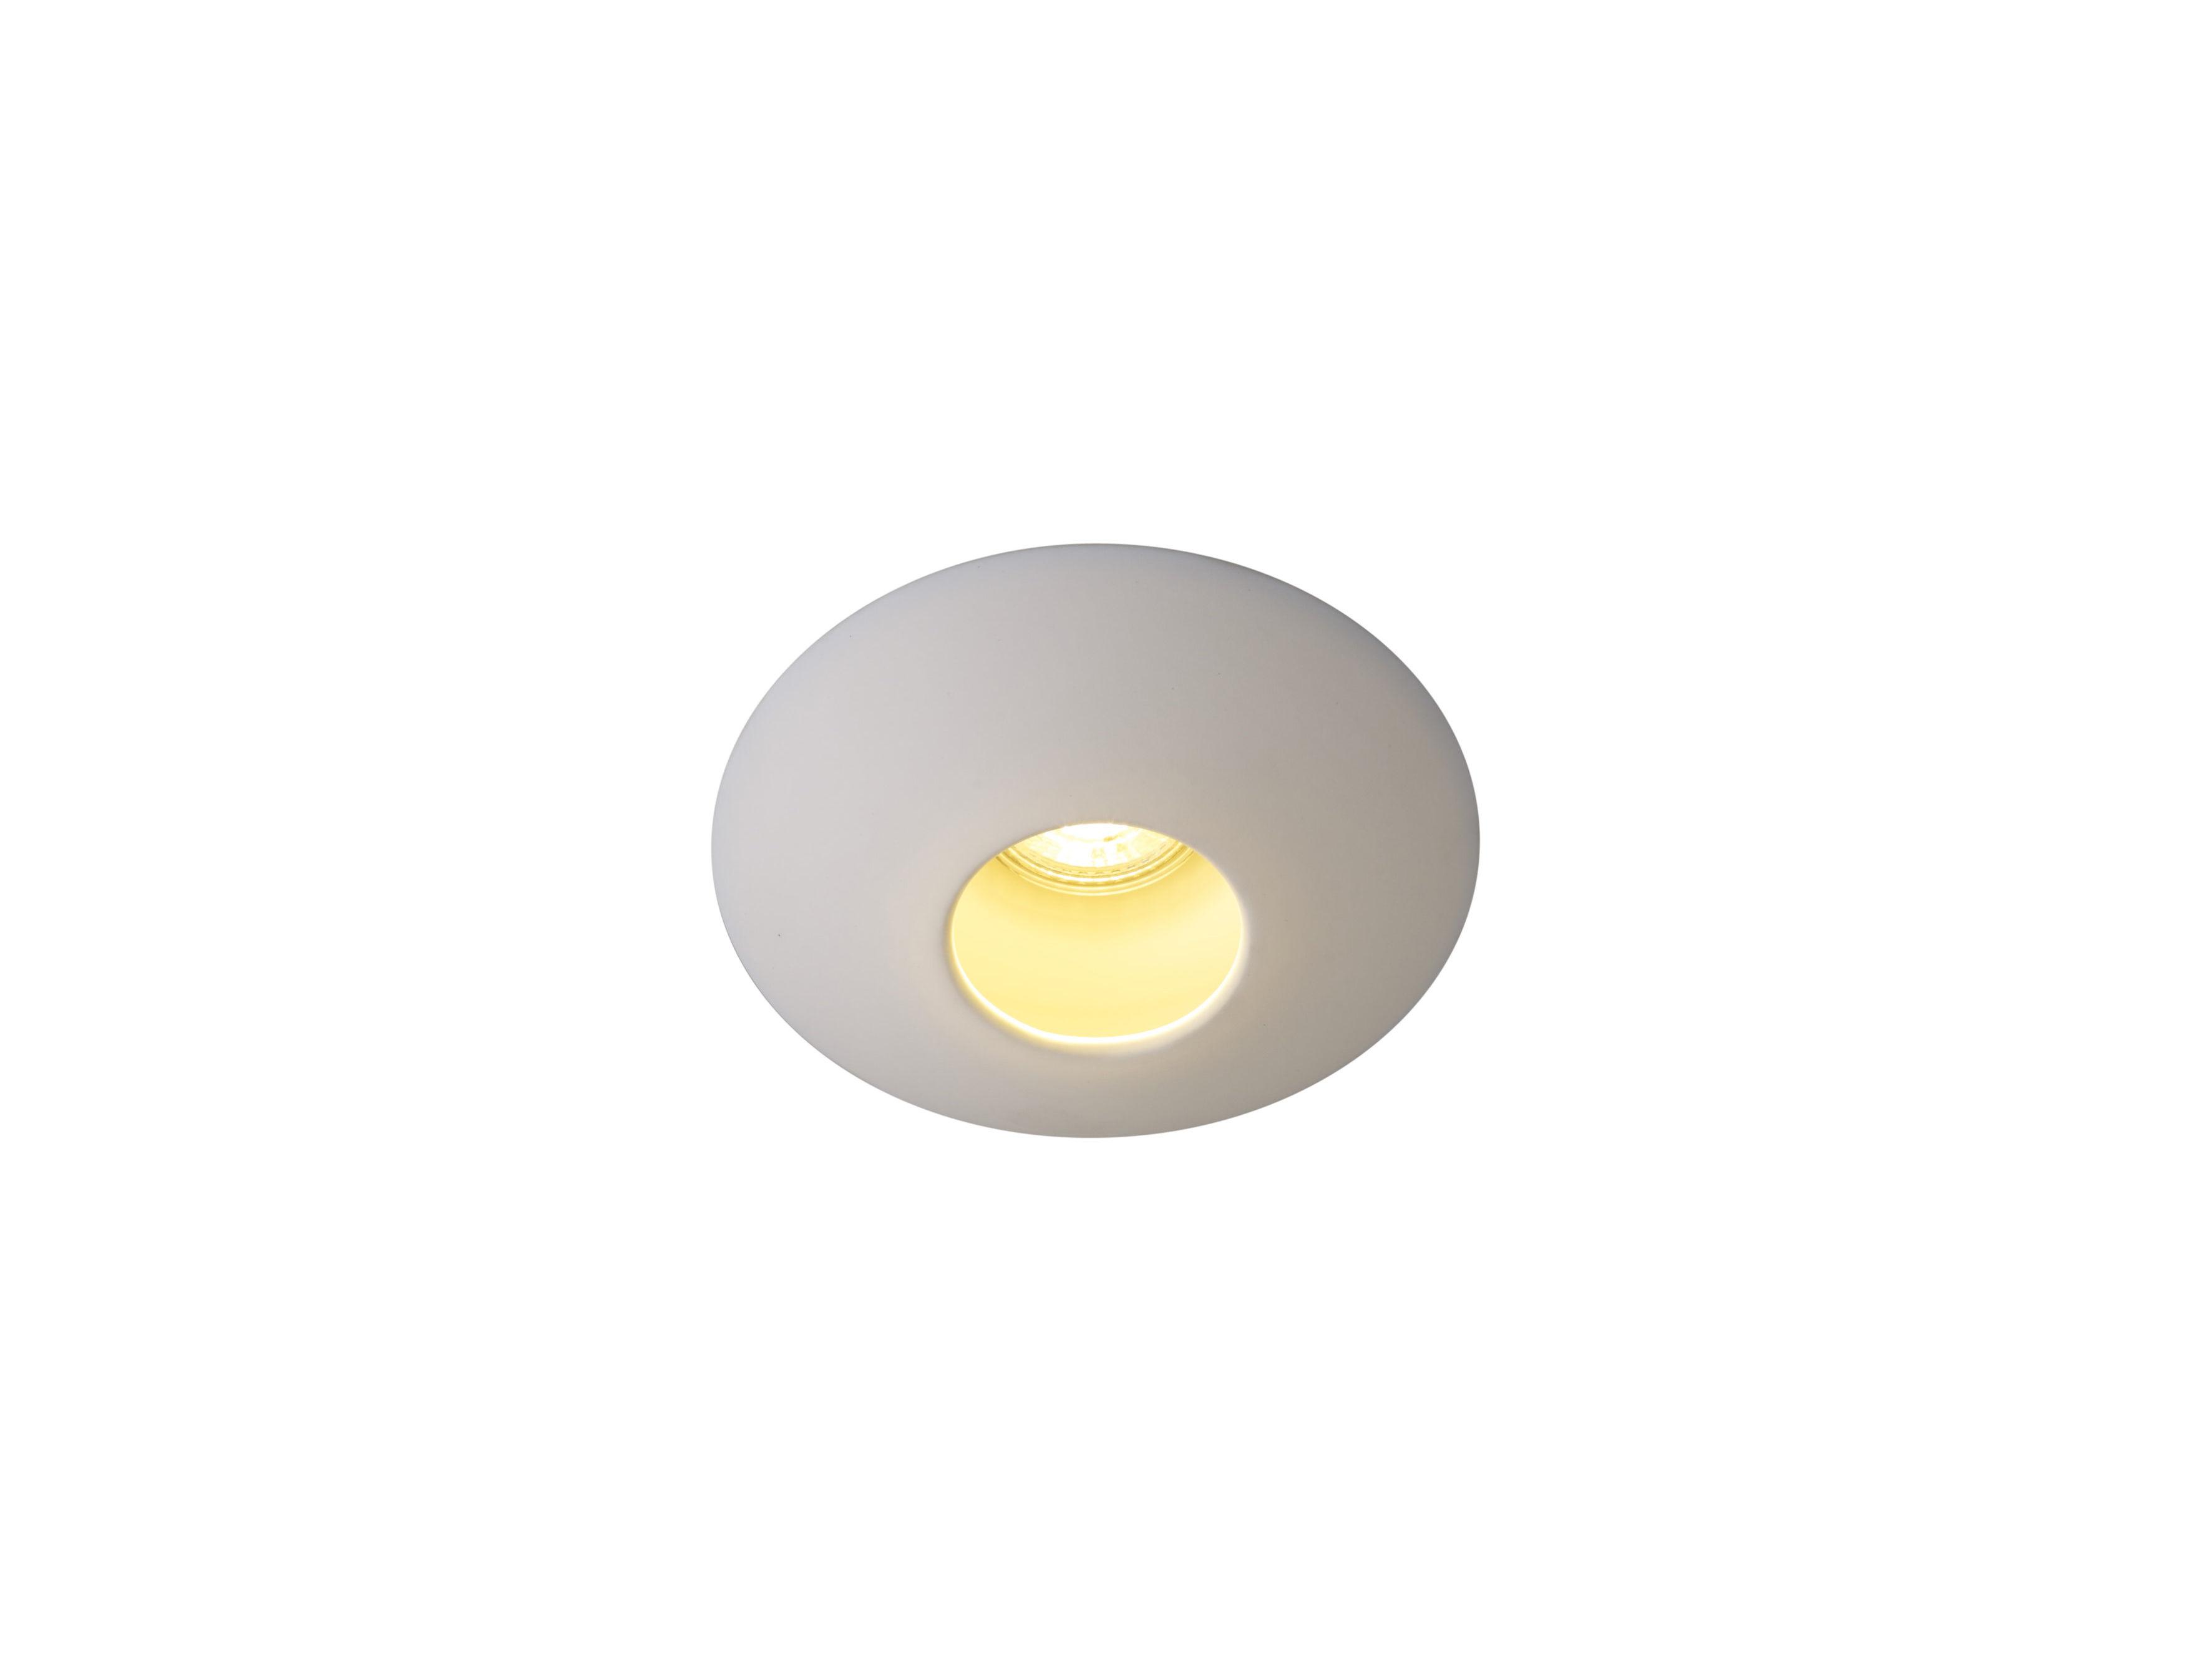 Lighting - Ceiling Lights - Sopra Downlight Ceiling light - / Integrated spotlight Smooth porcelain by Original BTC - White - China